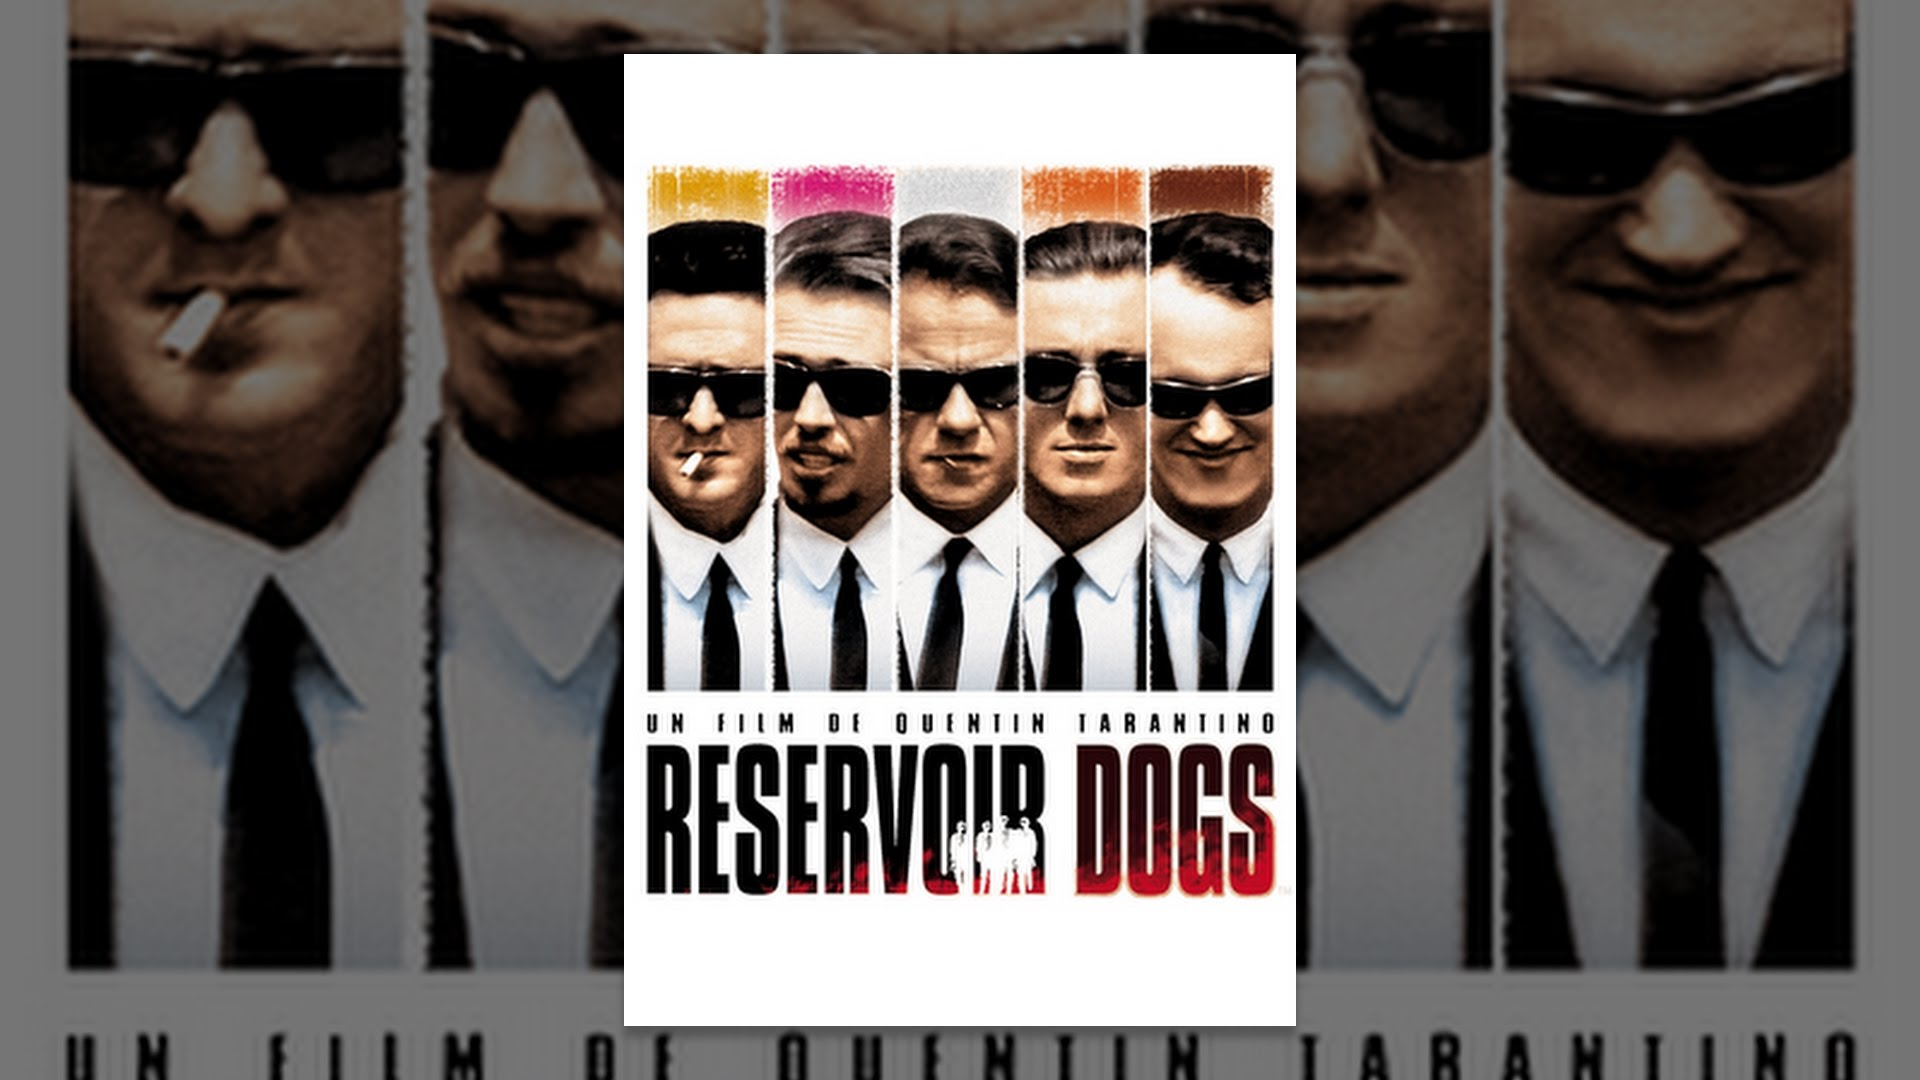 masculinity in reservoir dogs